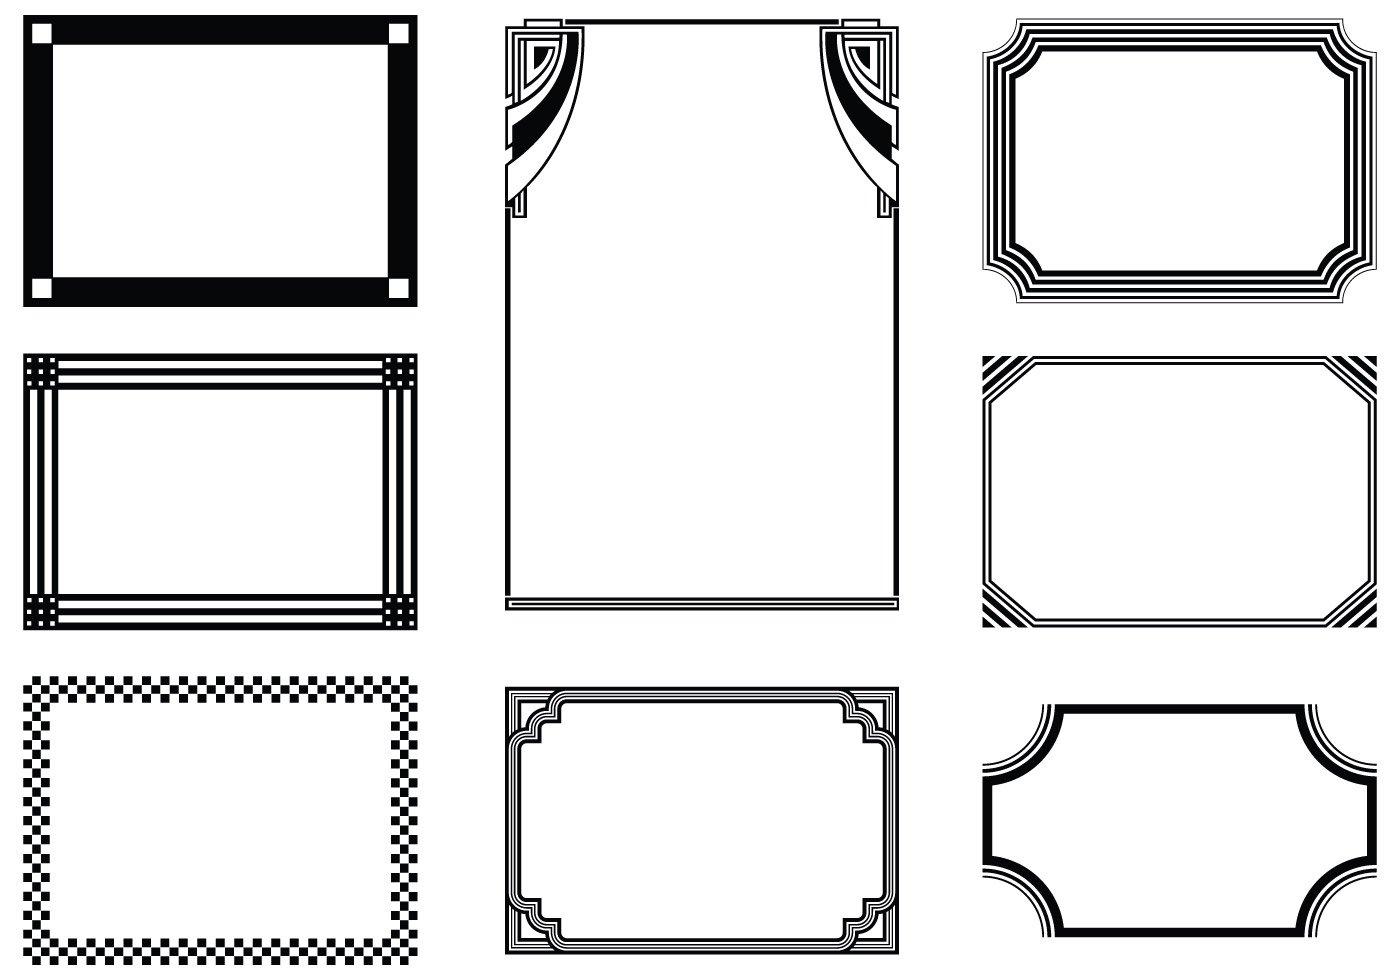 Graphic Frames Brushes Pack - Free Photoshop Brushes at Brusheezy!